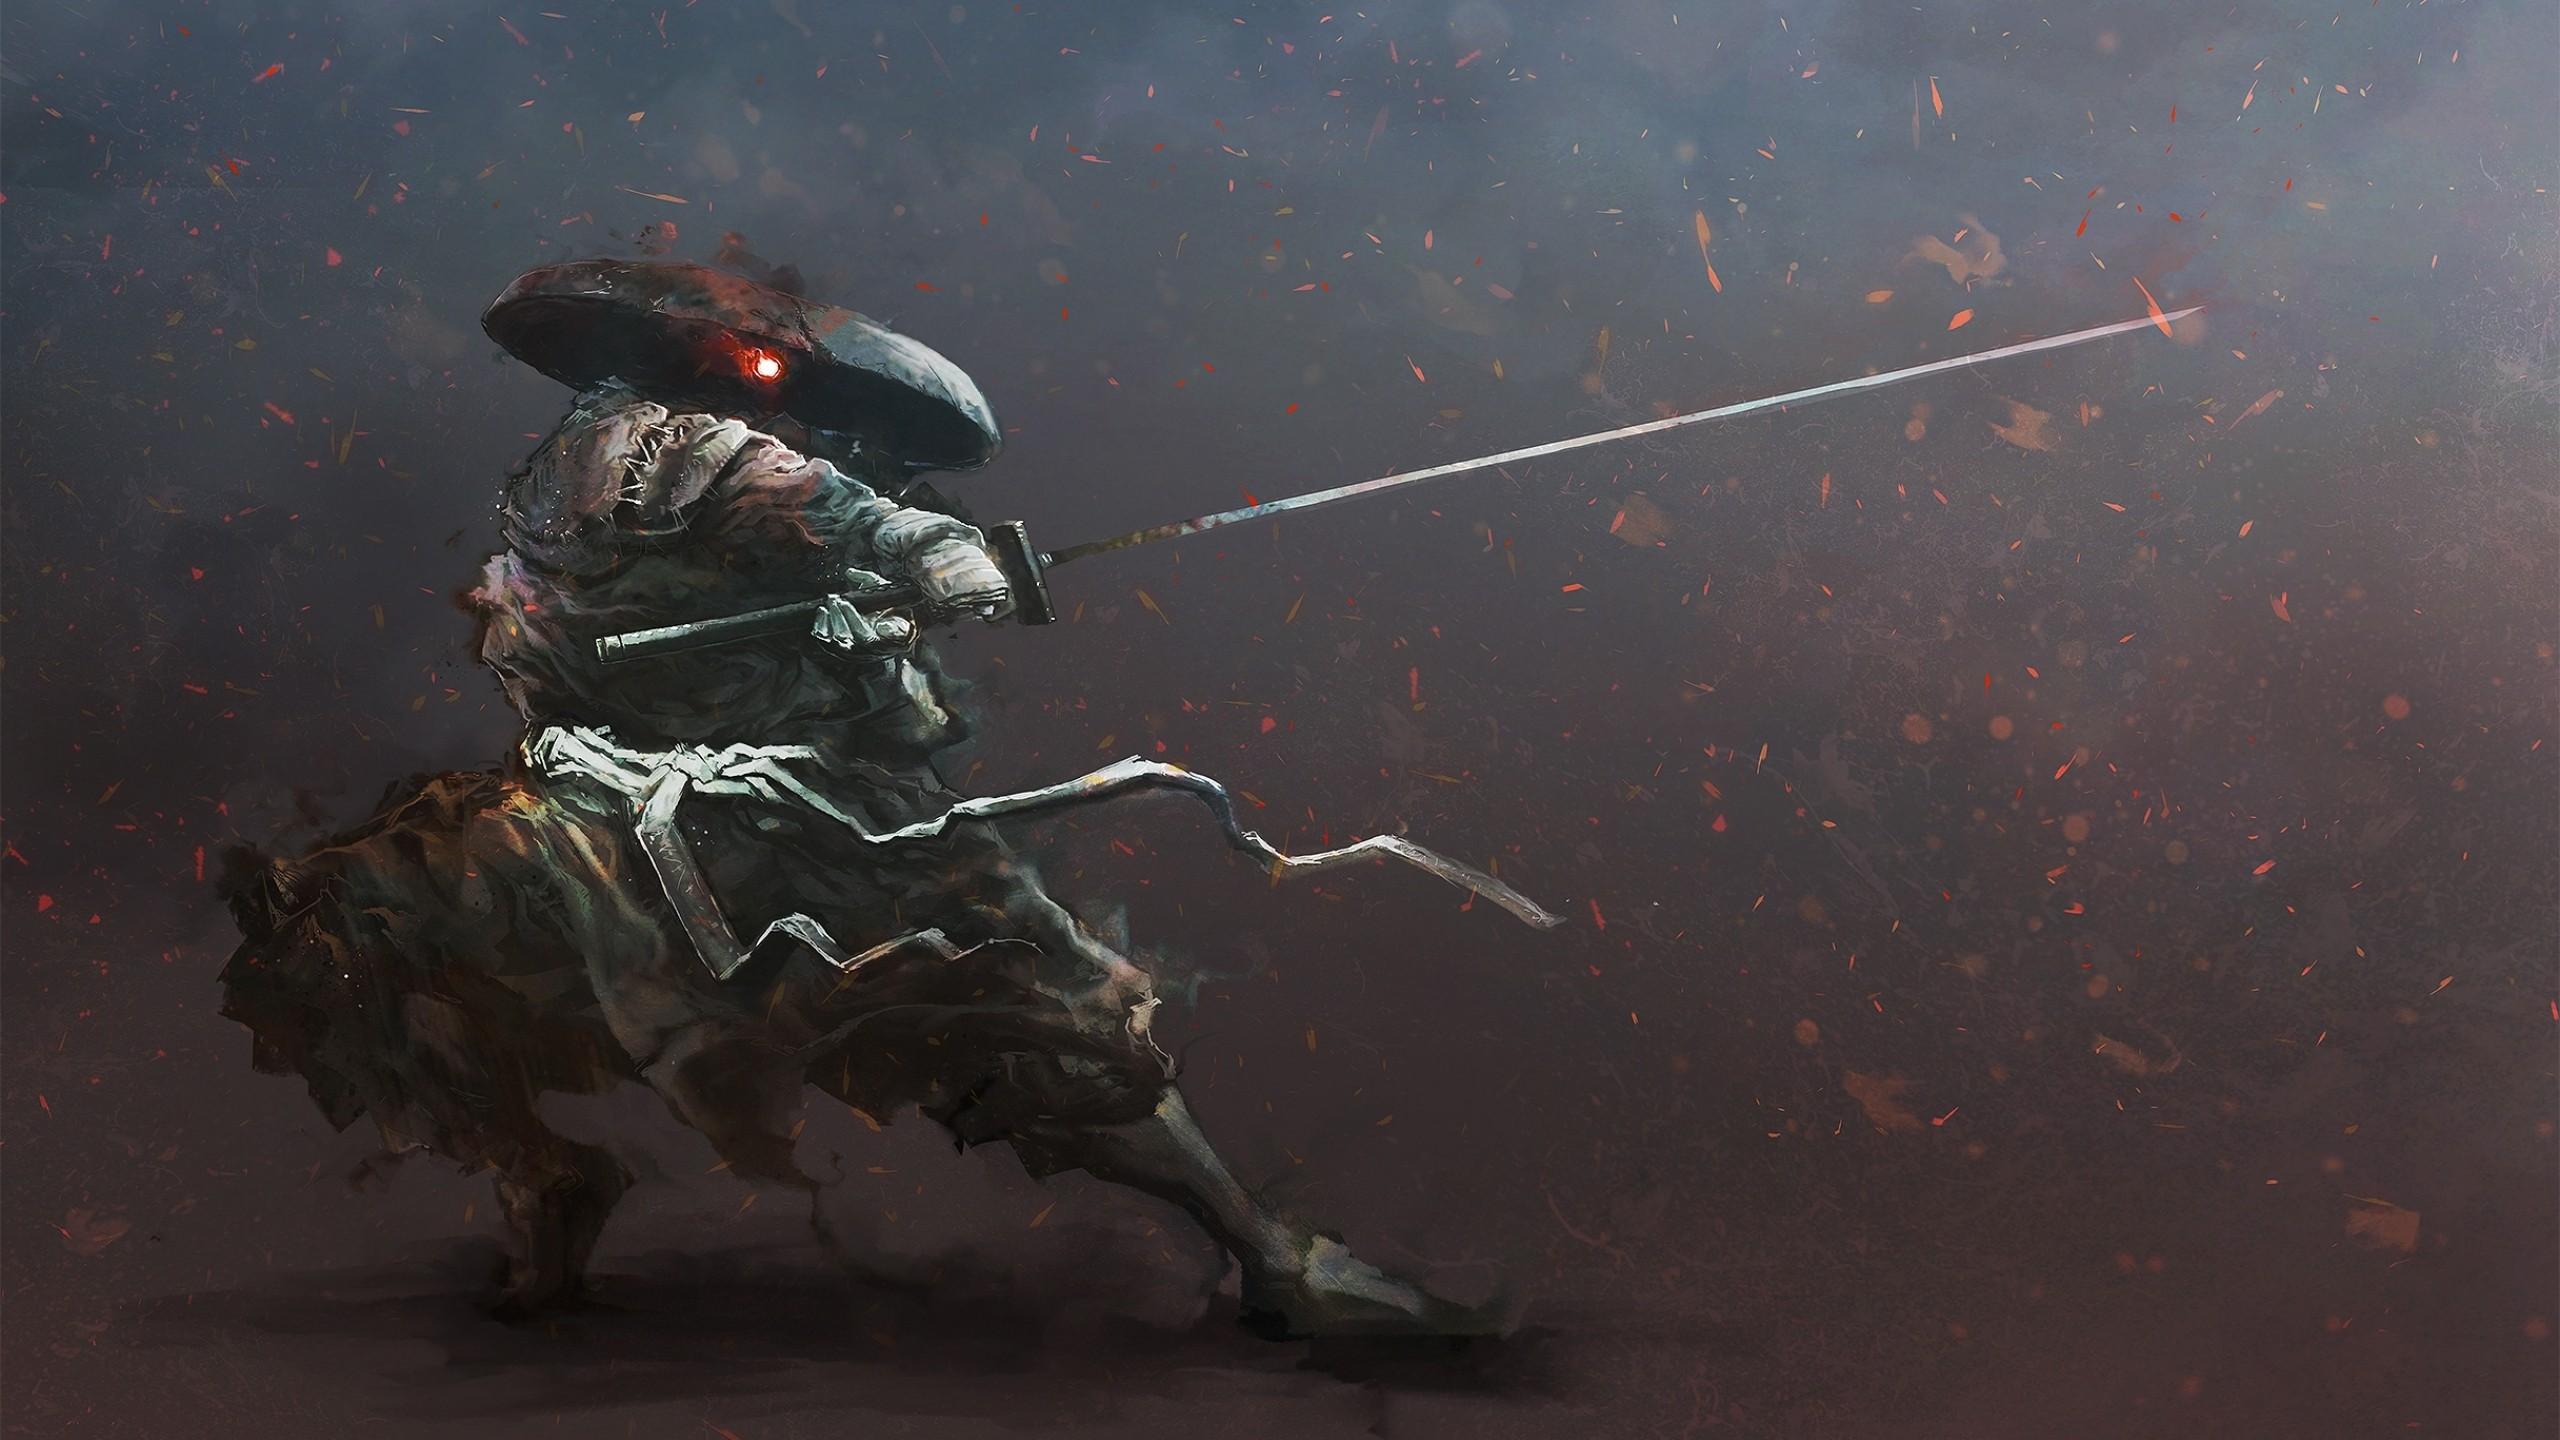 Wallpaper : digital art, artwork, katana, warrior, samurai ...